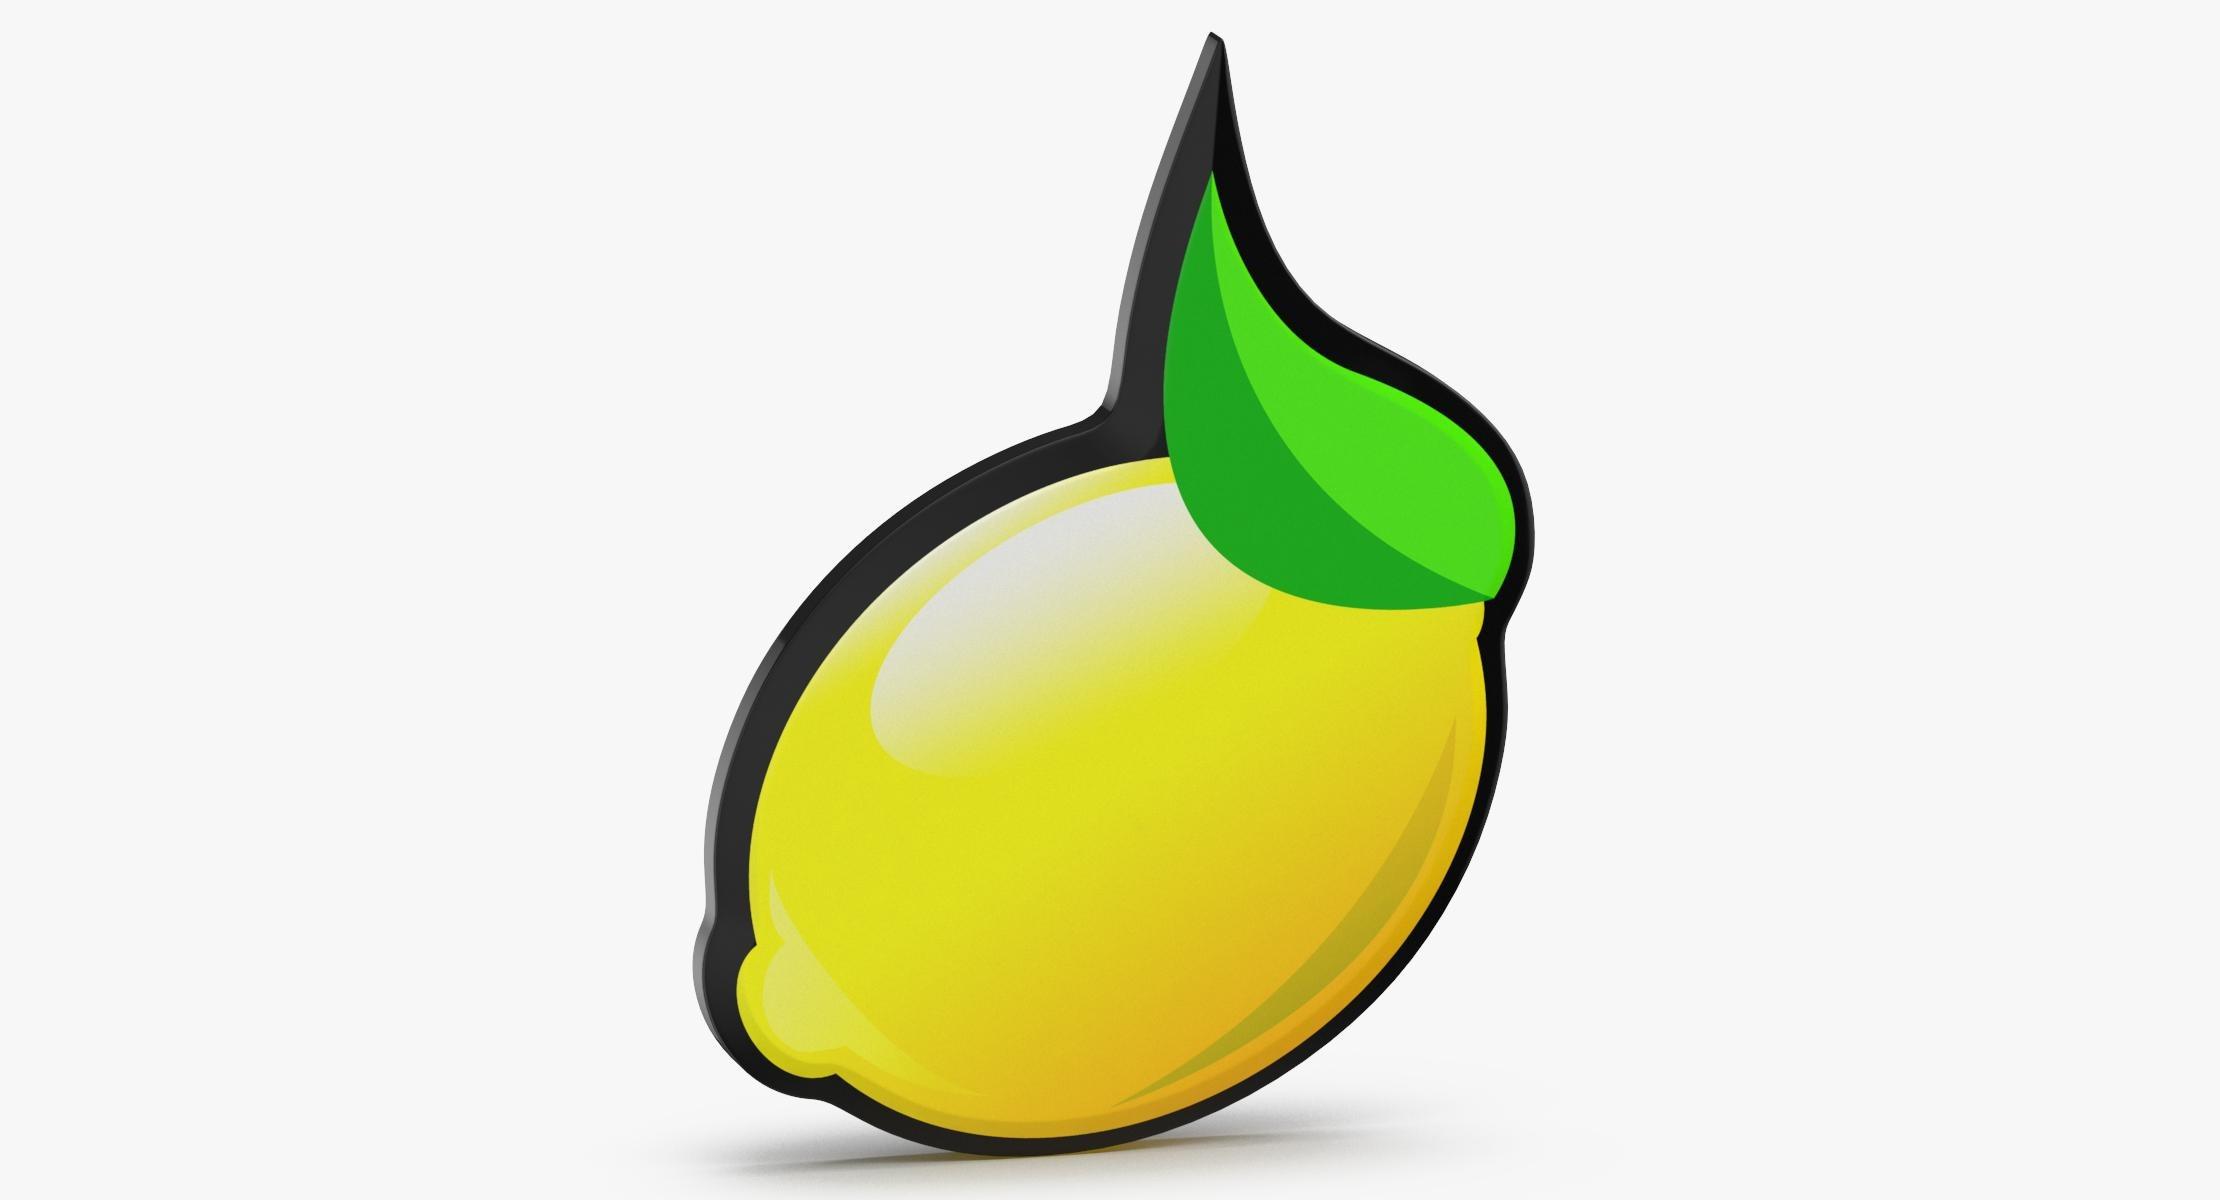 Video Slot Machine Lemon - reel 1